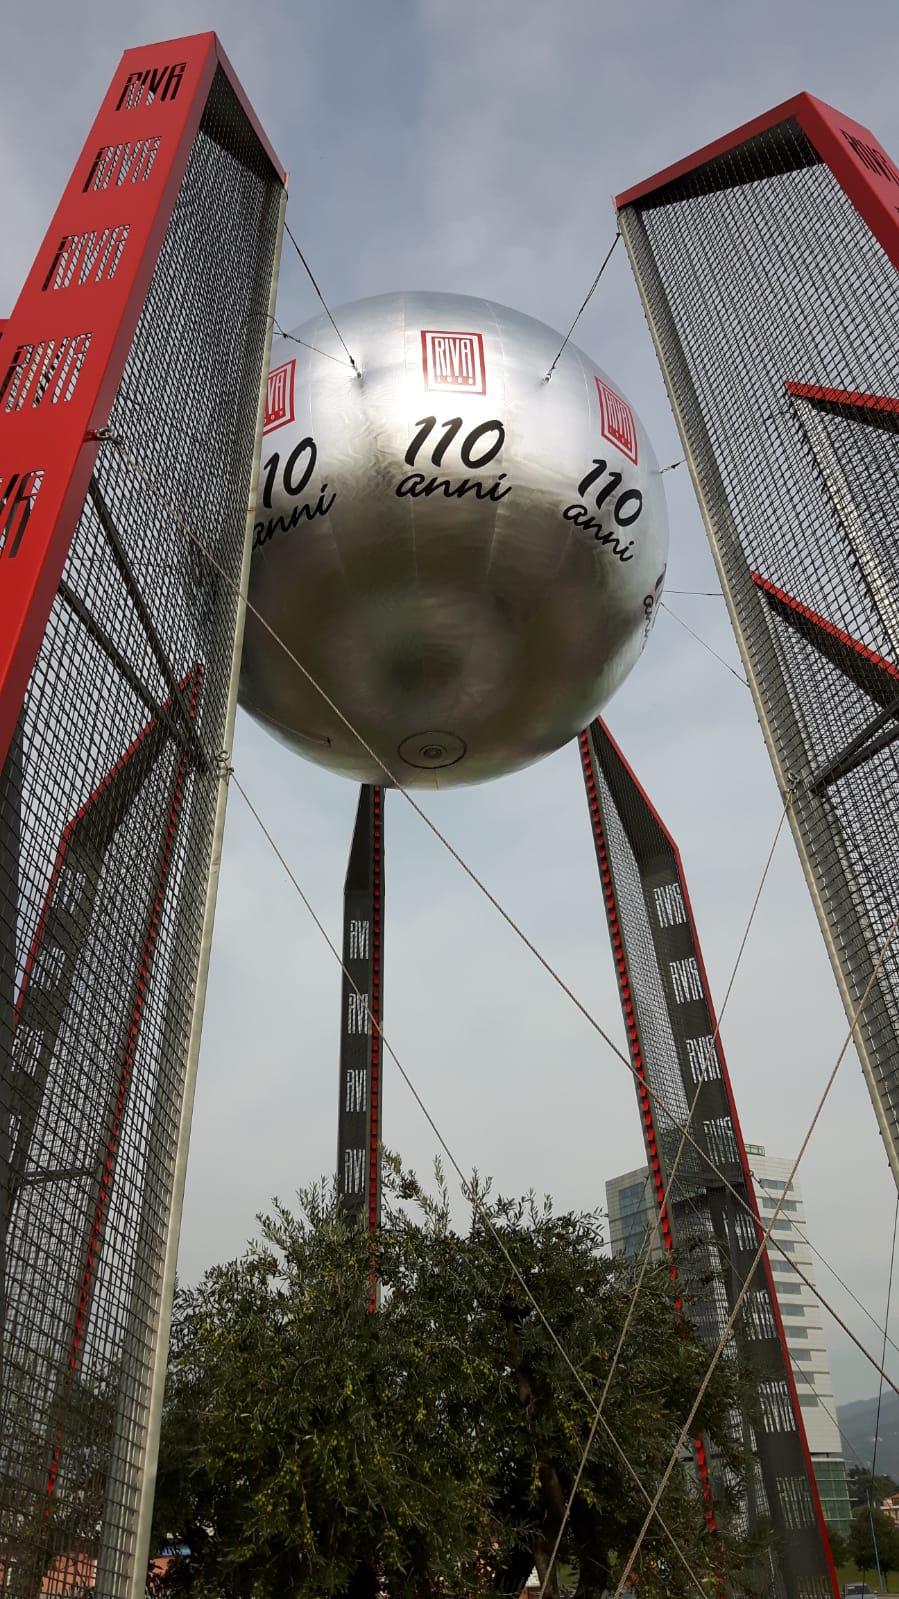 Pallone gigante gonfiabile